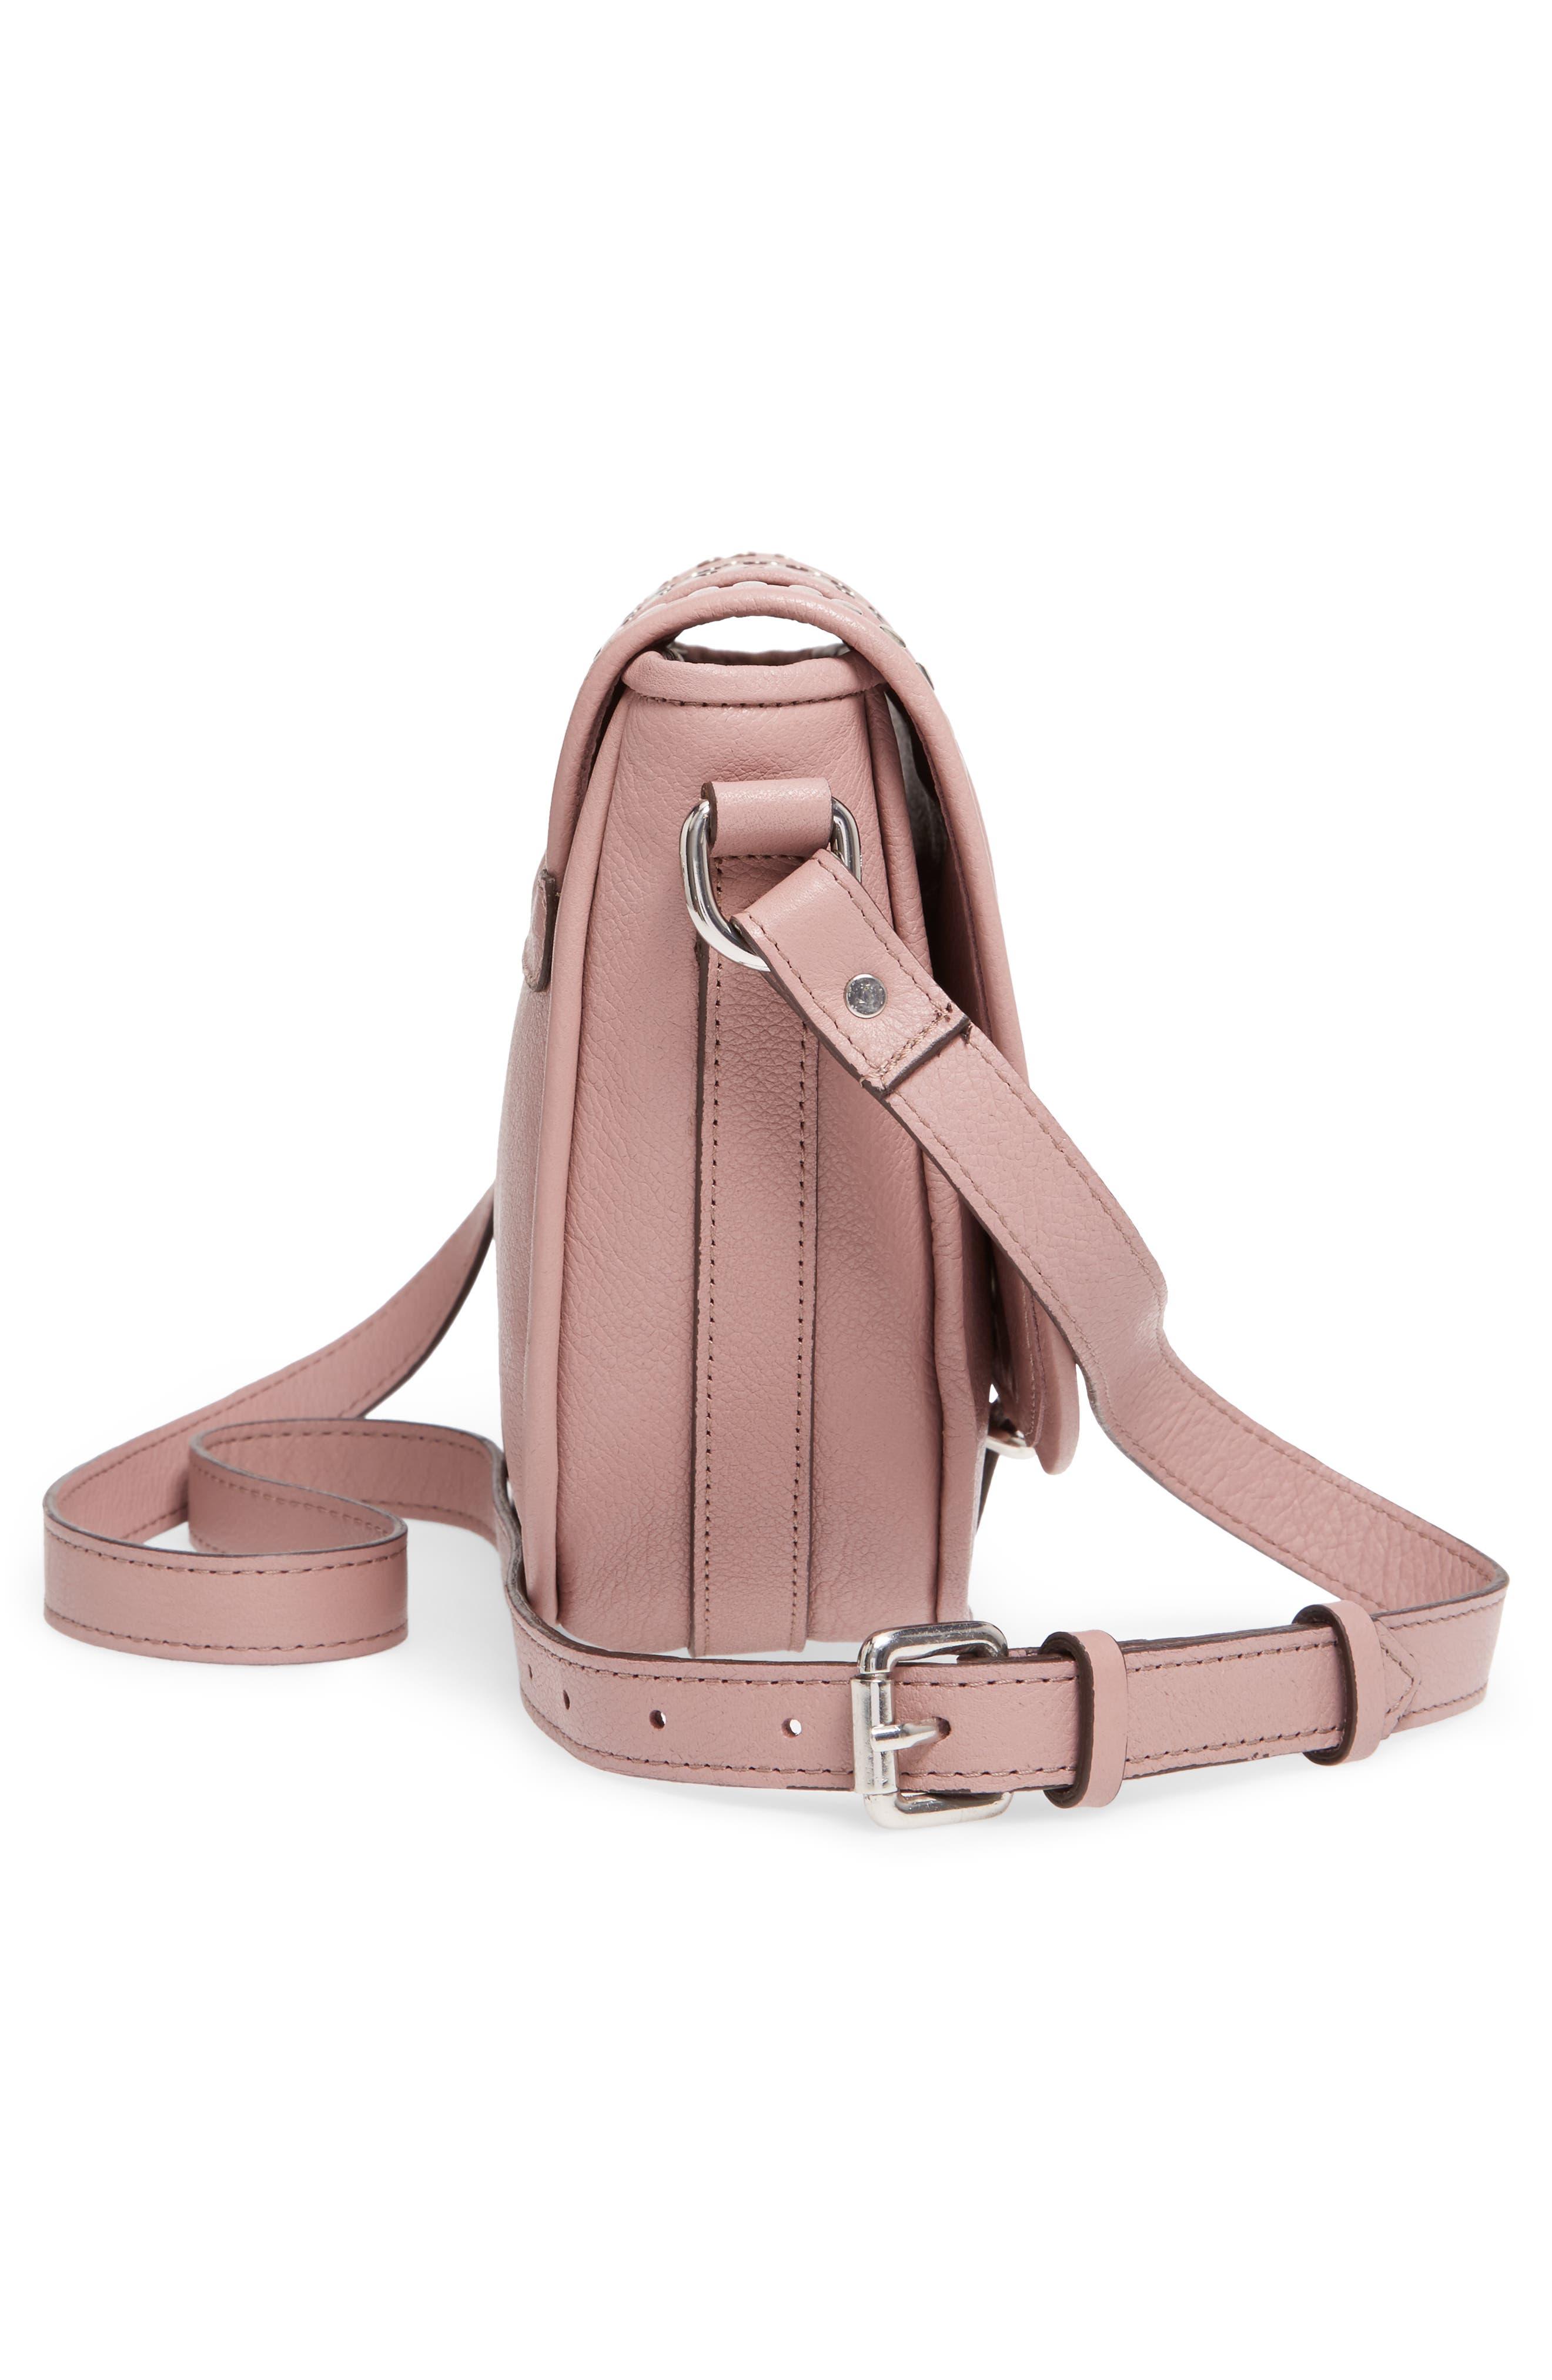 Premium Leather Studded Shoulder Bag,                             Alternate thumbnail 5, color,                             Blush